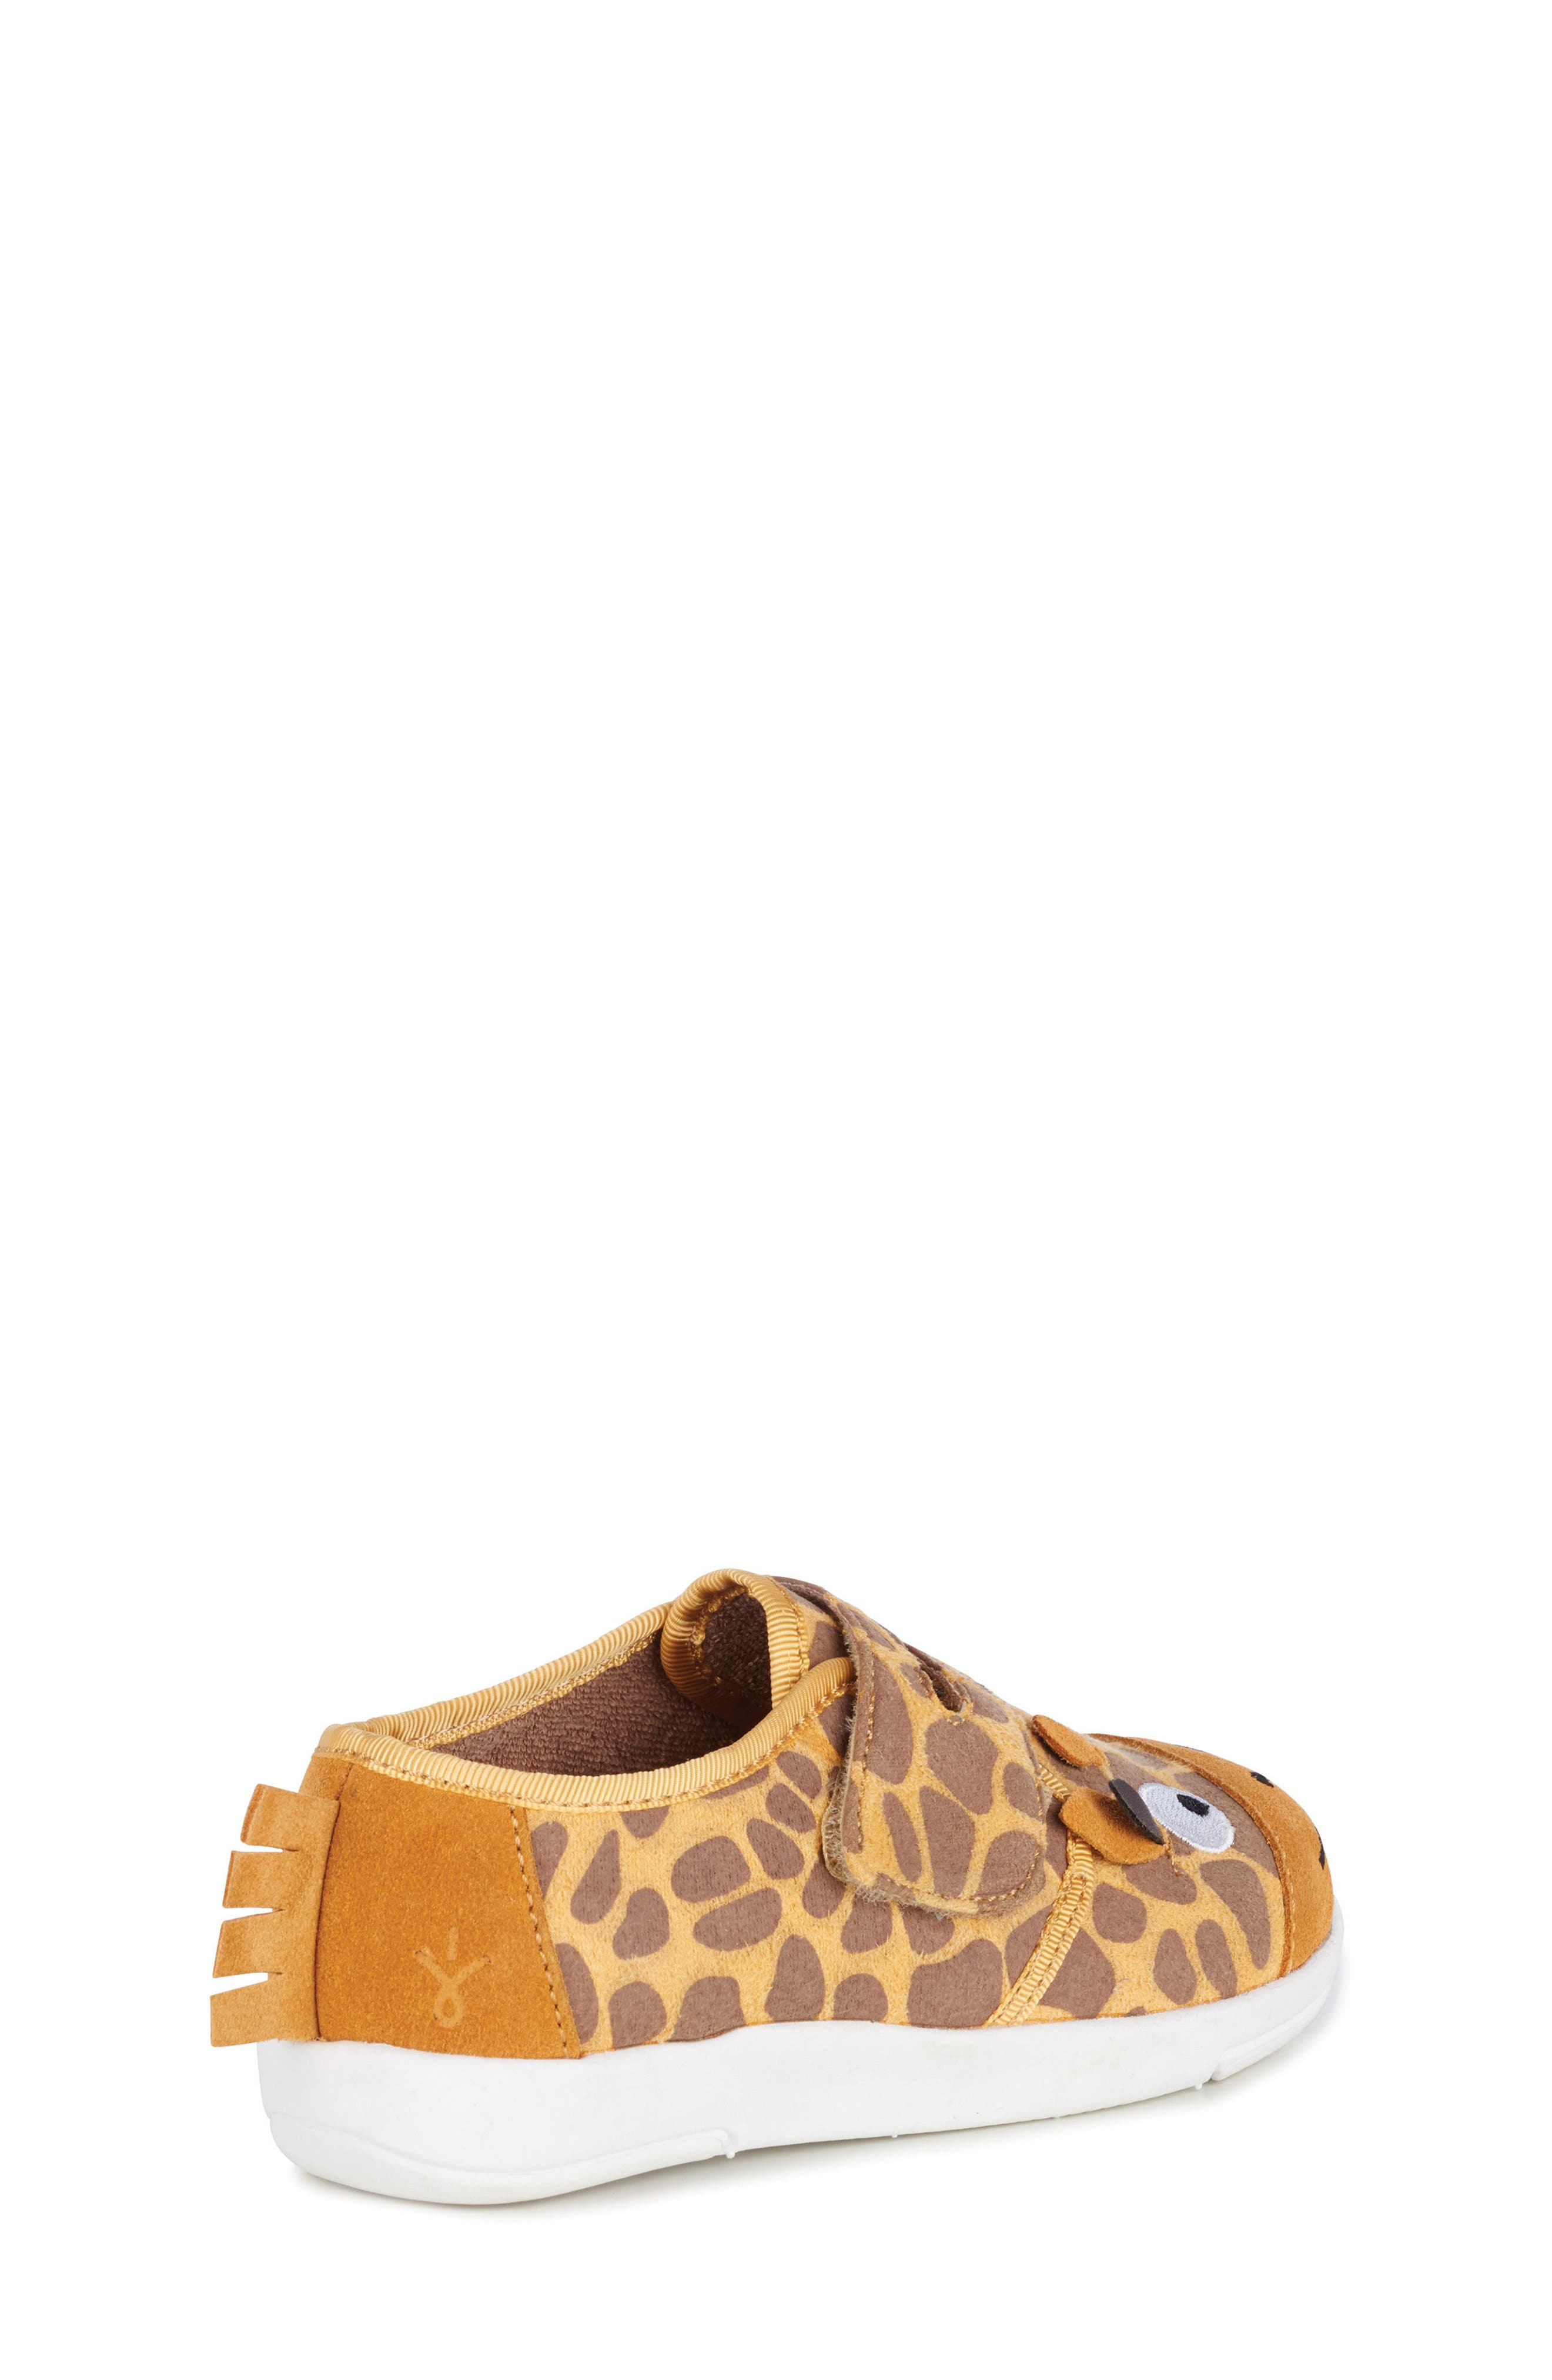 Giraffe Sneaker,                             Alternate thumbnail 6, color,                             Yellow